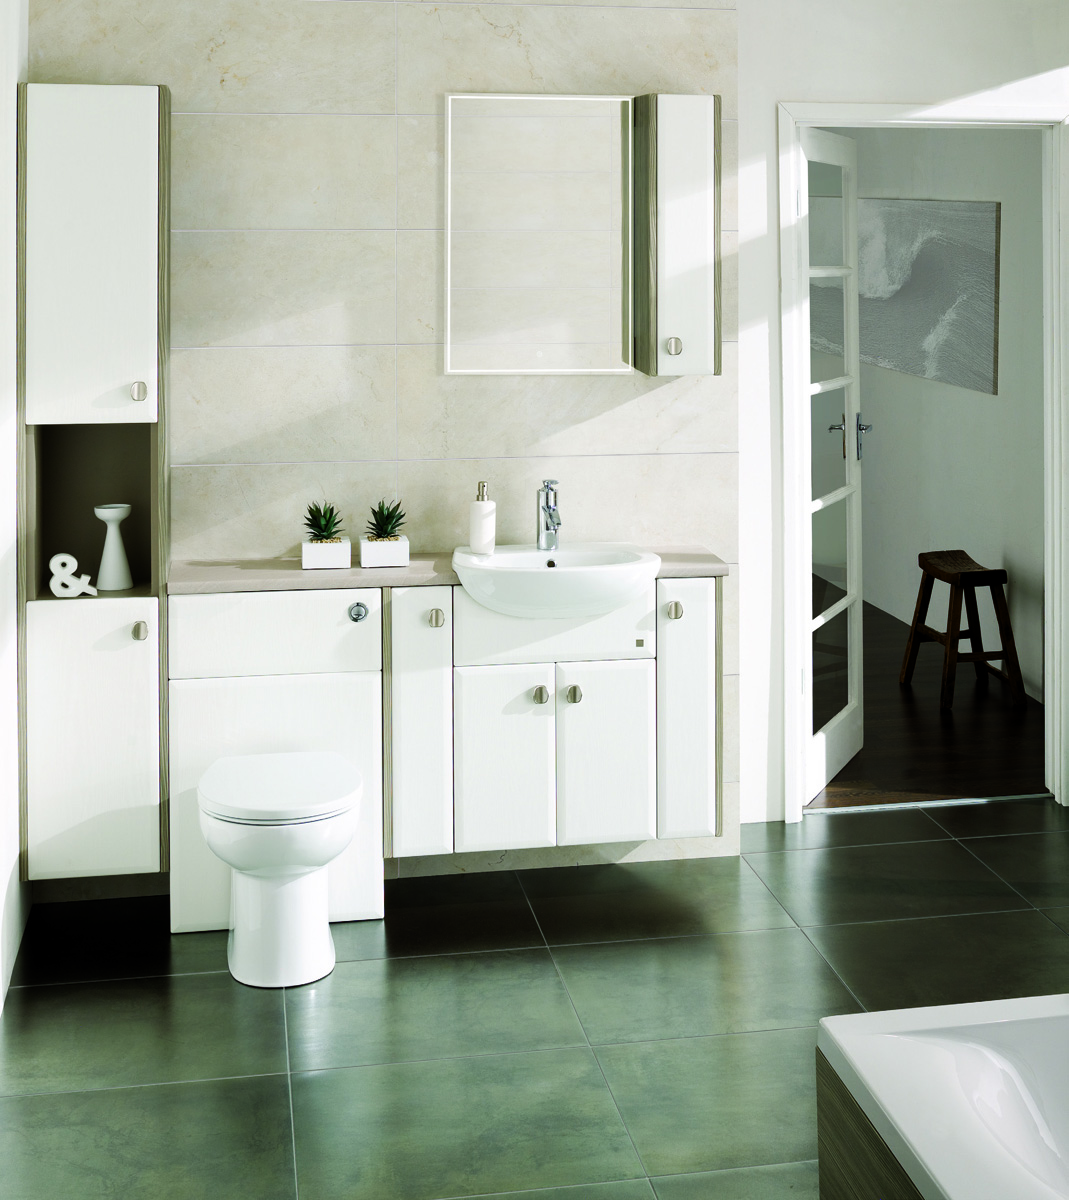 Calypso Fitted Bathroom Furniture